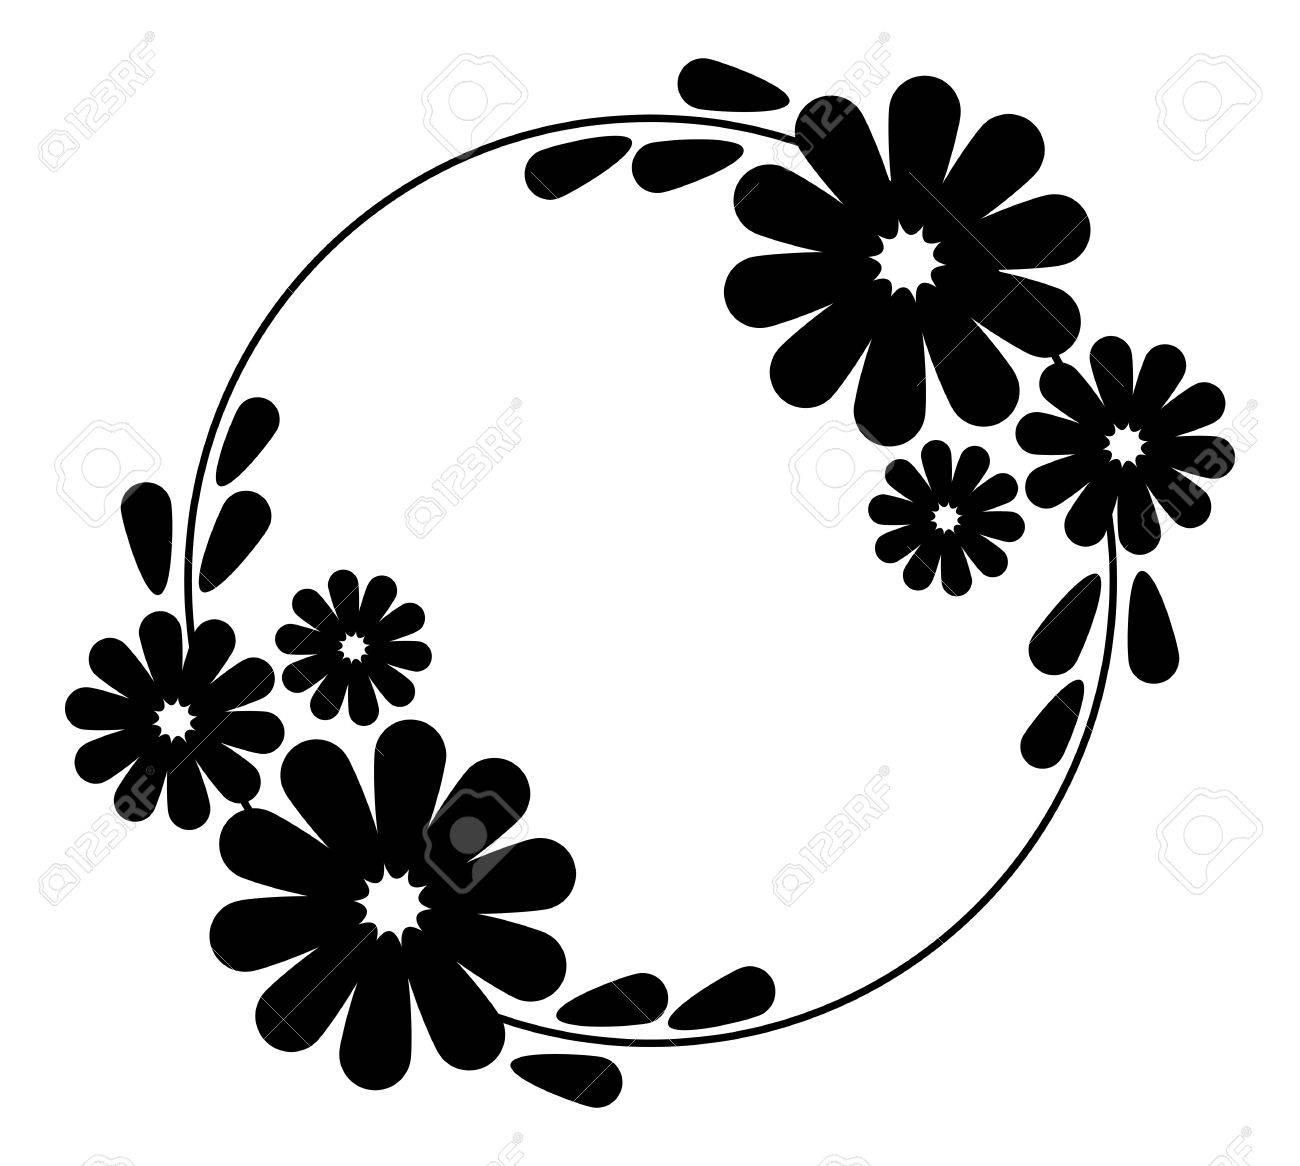 Flowers Vector Clipart.